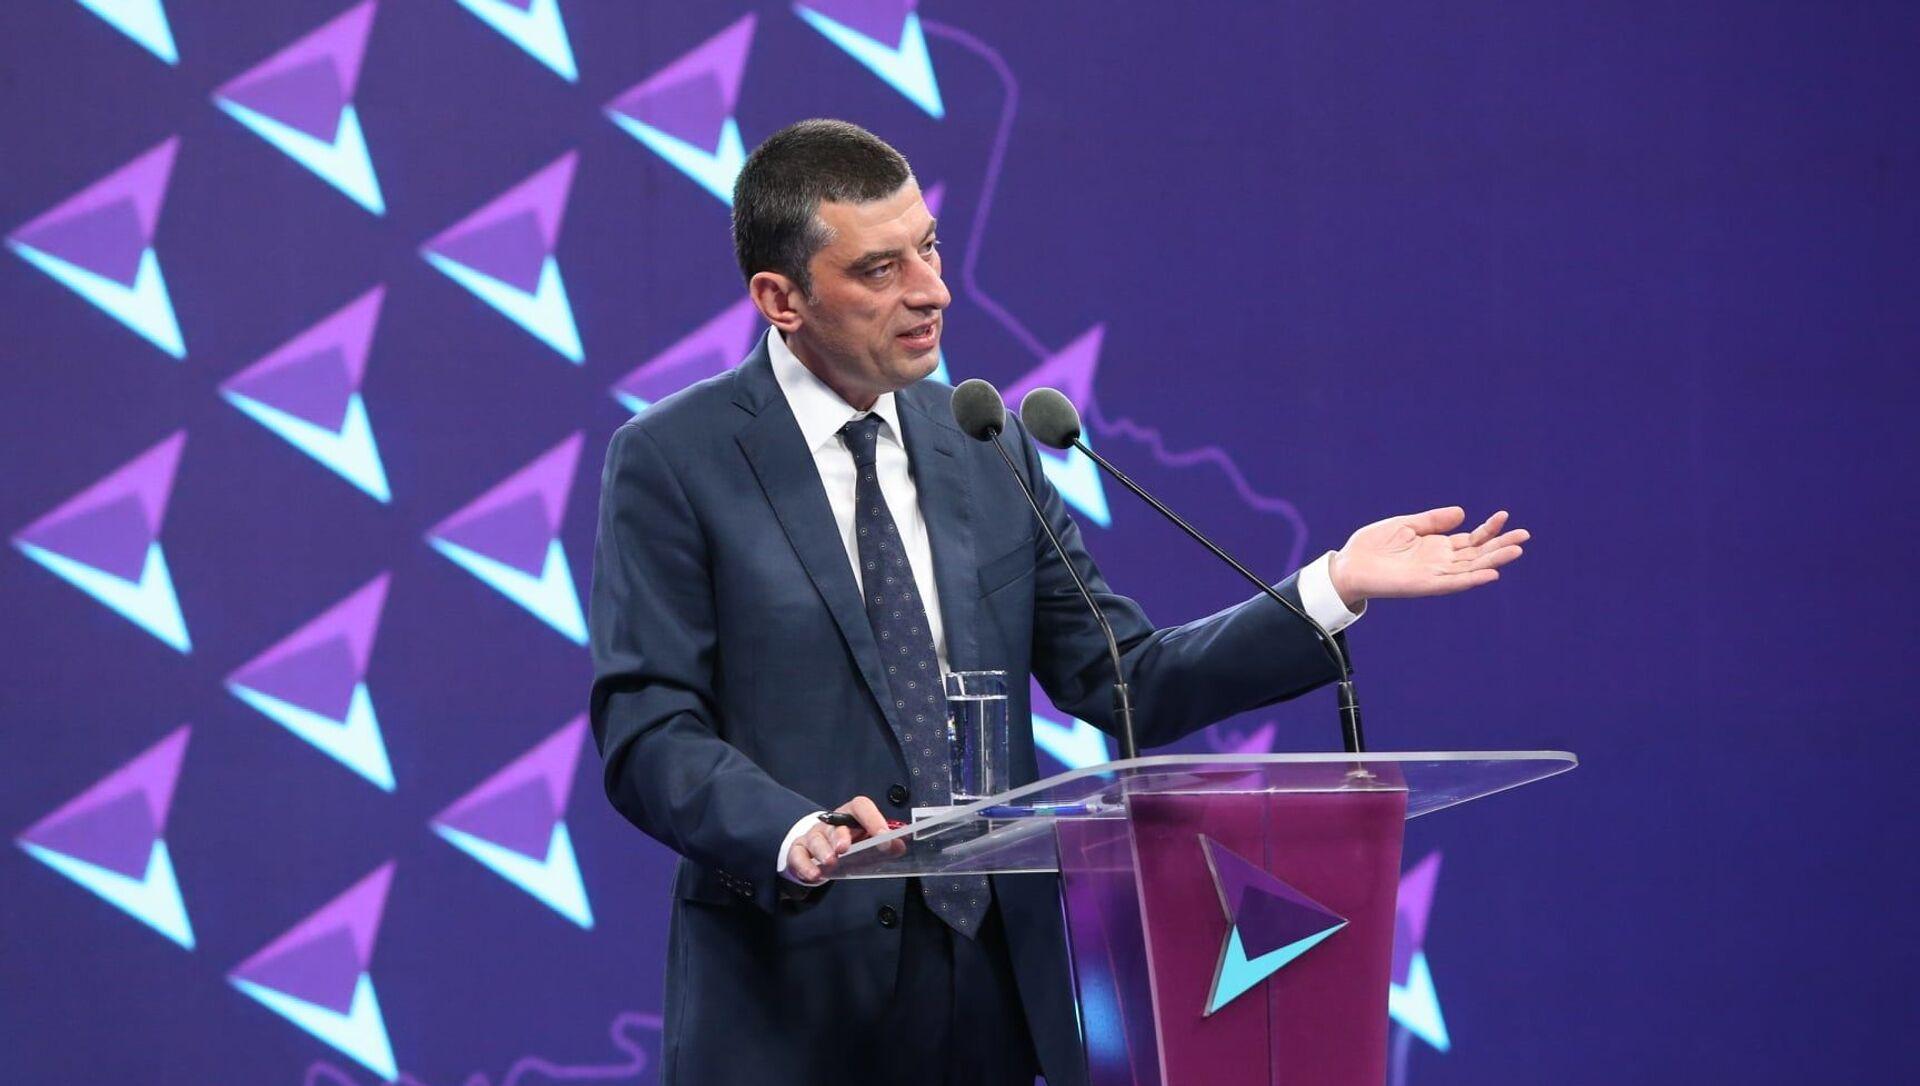 Георгий Гахария на презентации партии За Грузию - Sputnik Грузия, 1920, 06.06.2021